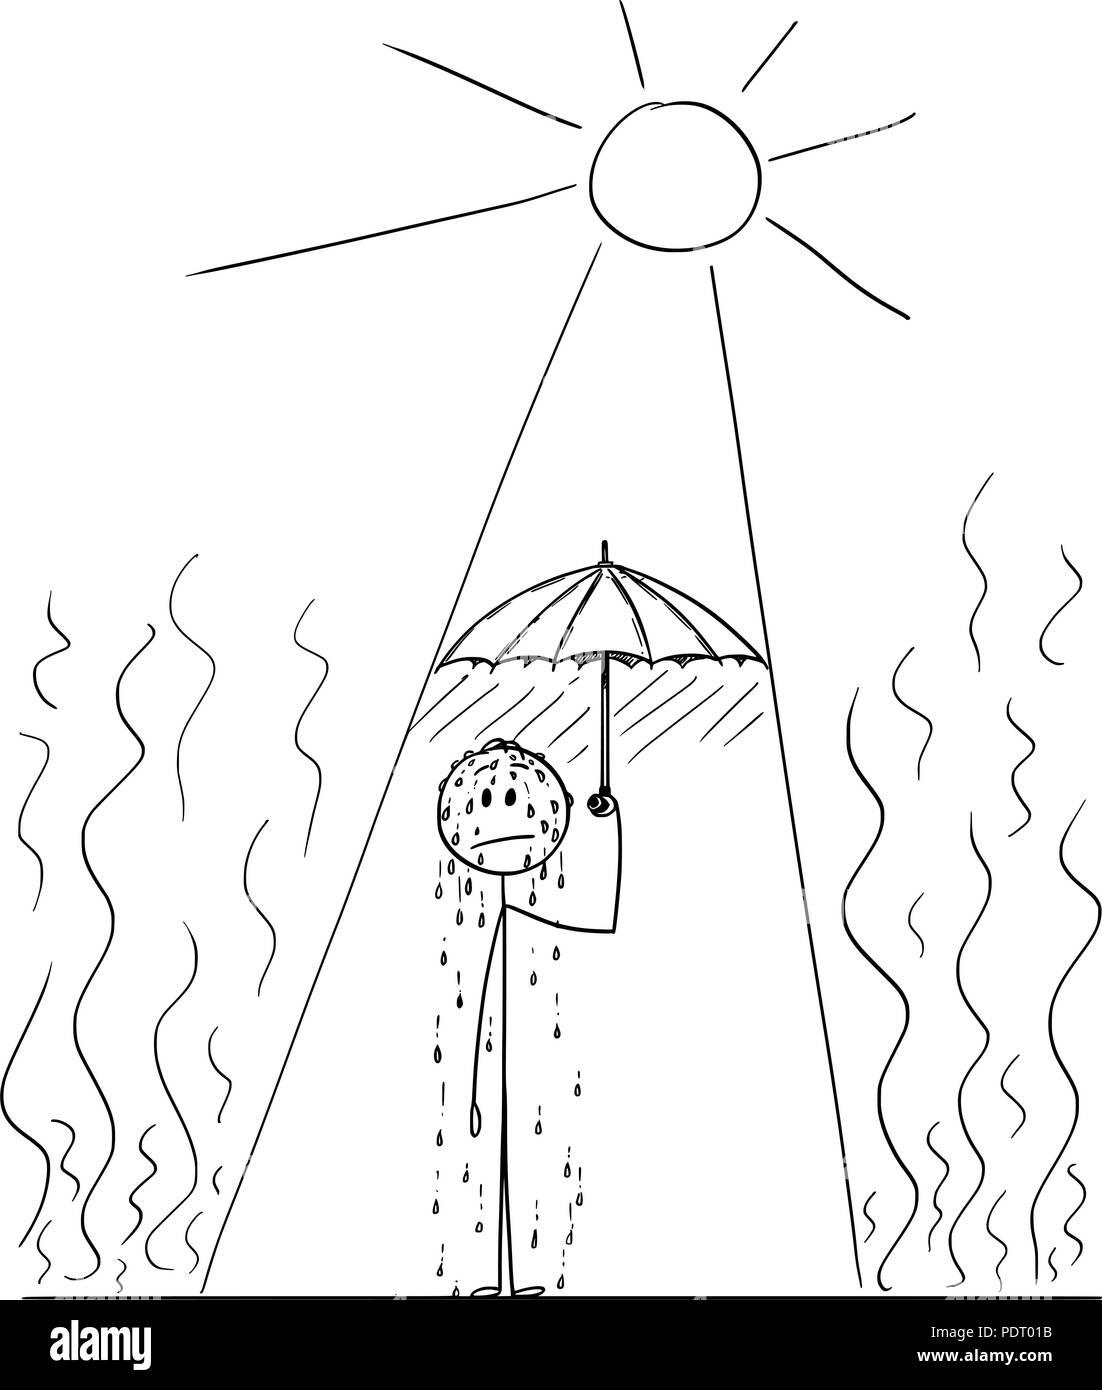 Cartoon of Sweating Man in Hot Summer Heat Hiding Under Umbrella - Stock Vector